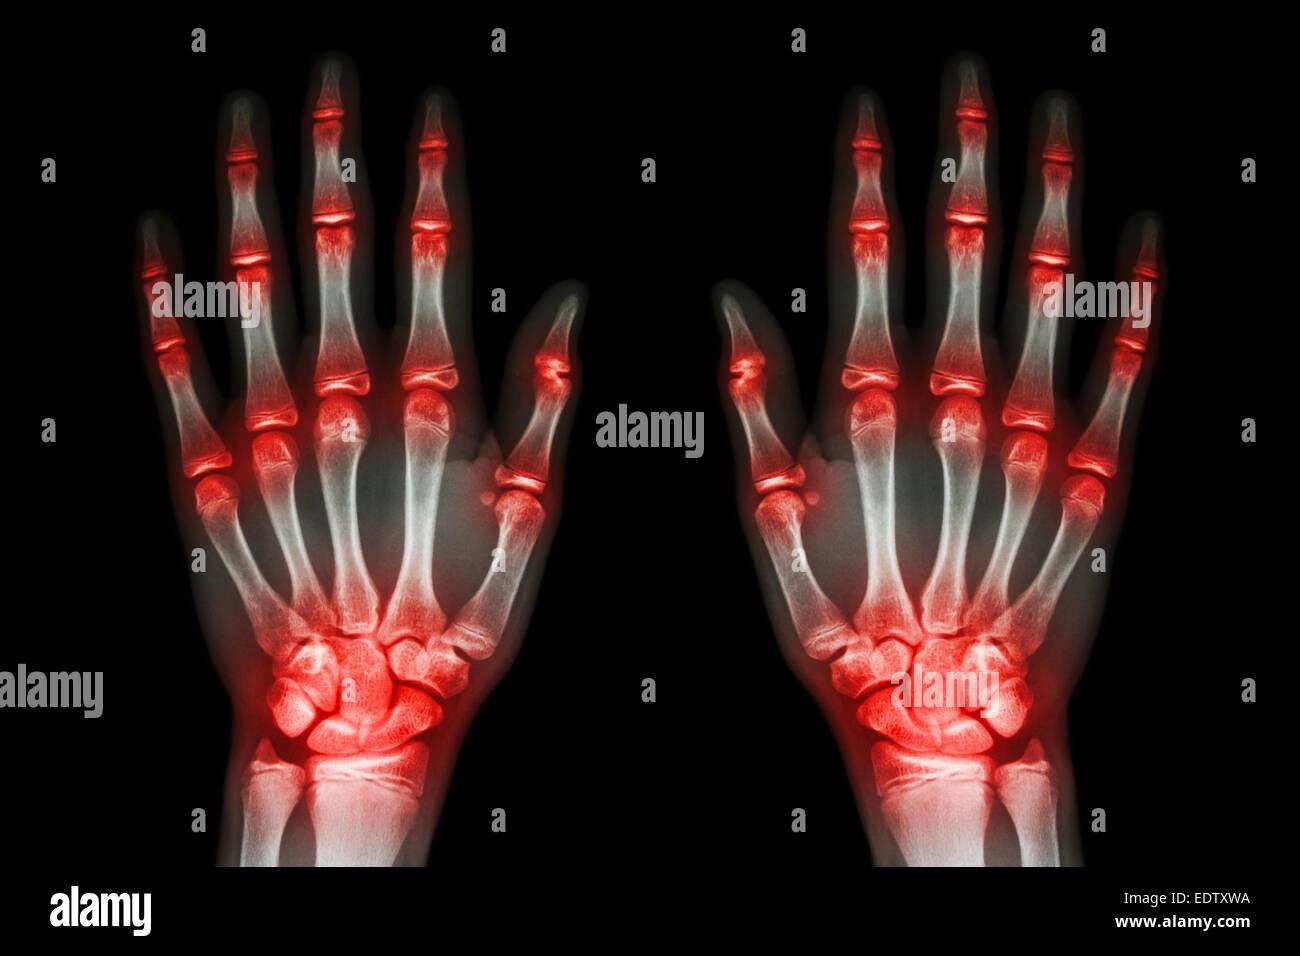 Arthritis Hands Xray Stock Photos & Arthritis Hands Xray Stock ...